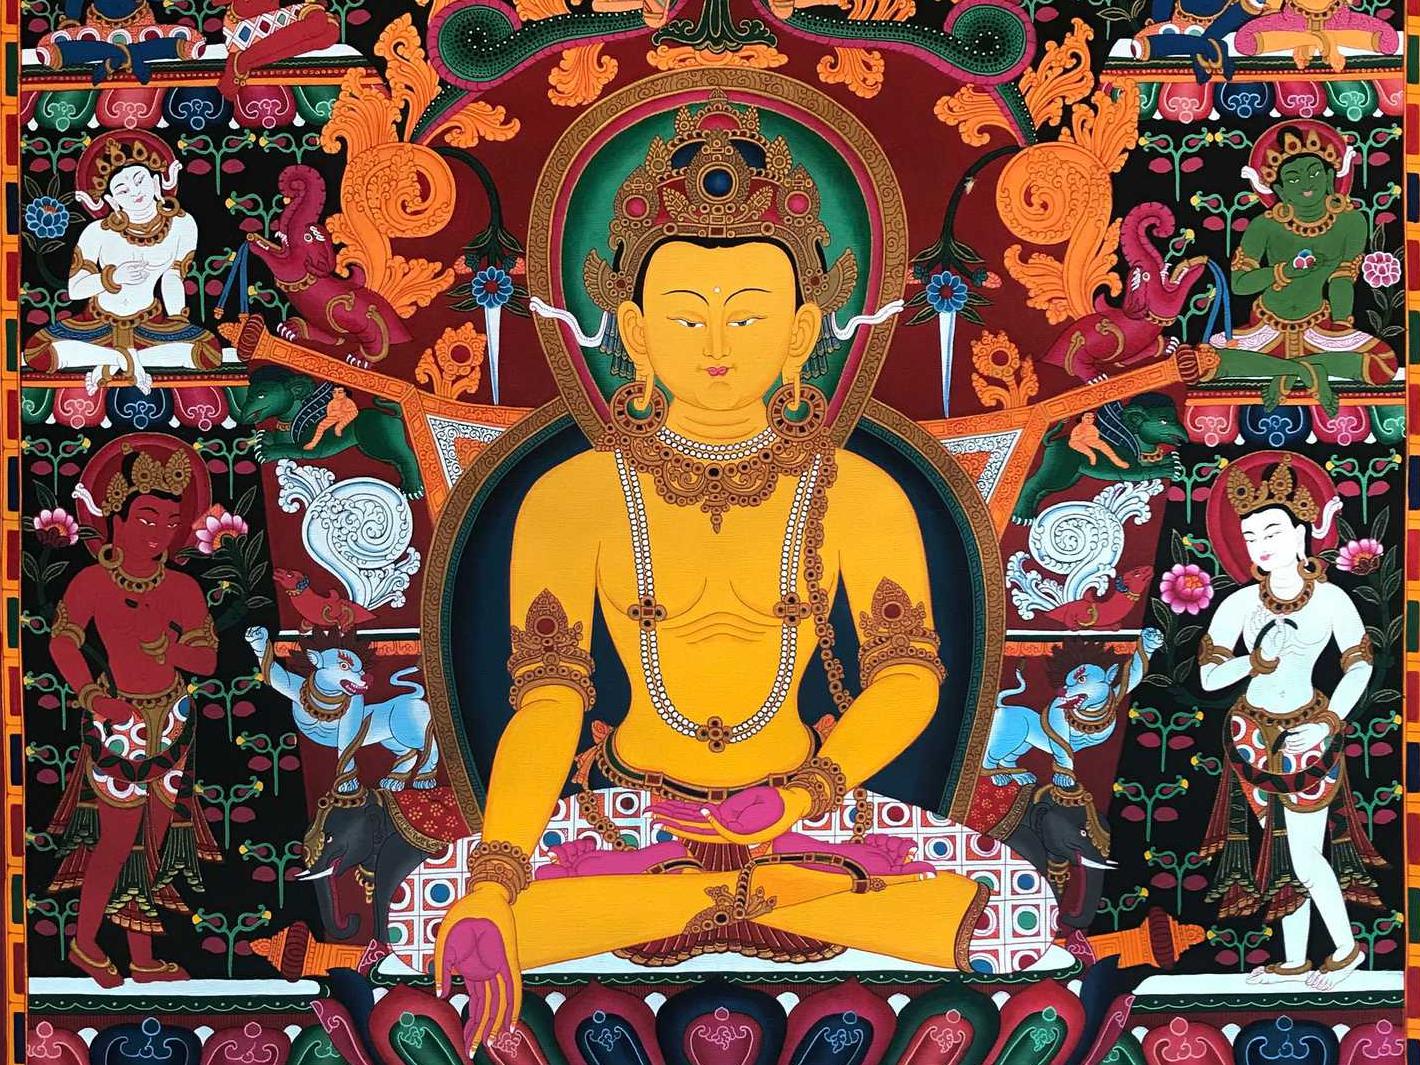 The Ratnasambhava Mantra Banner